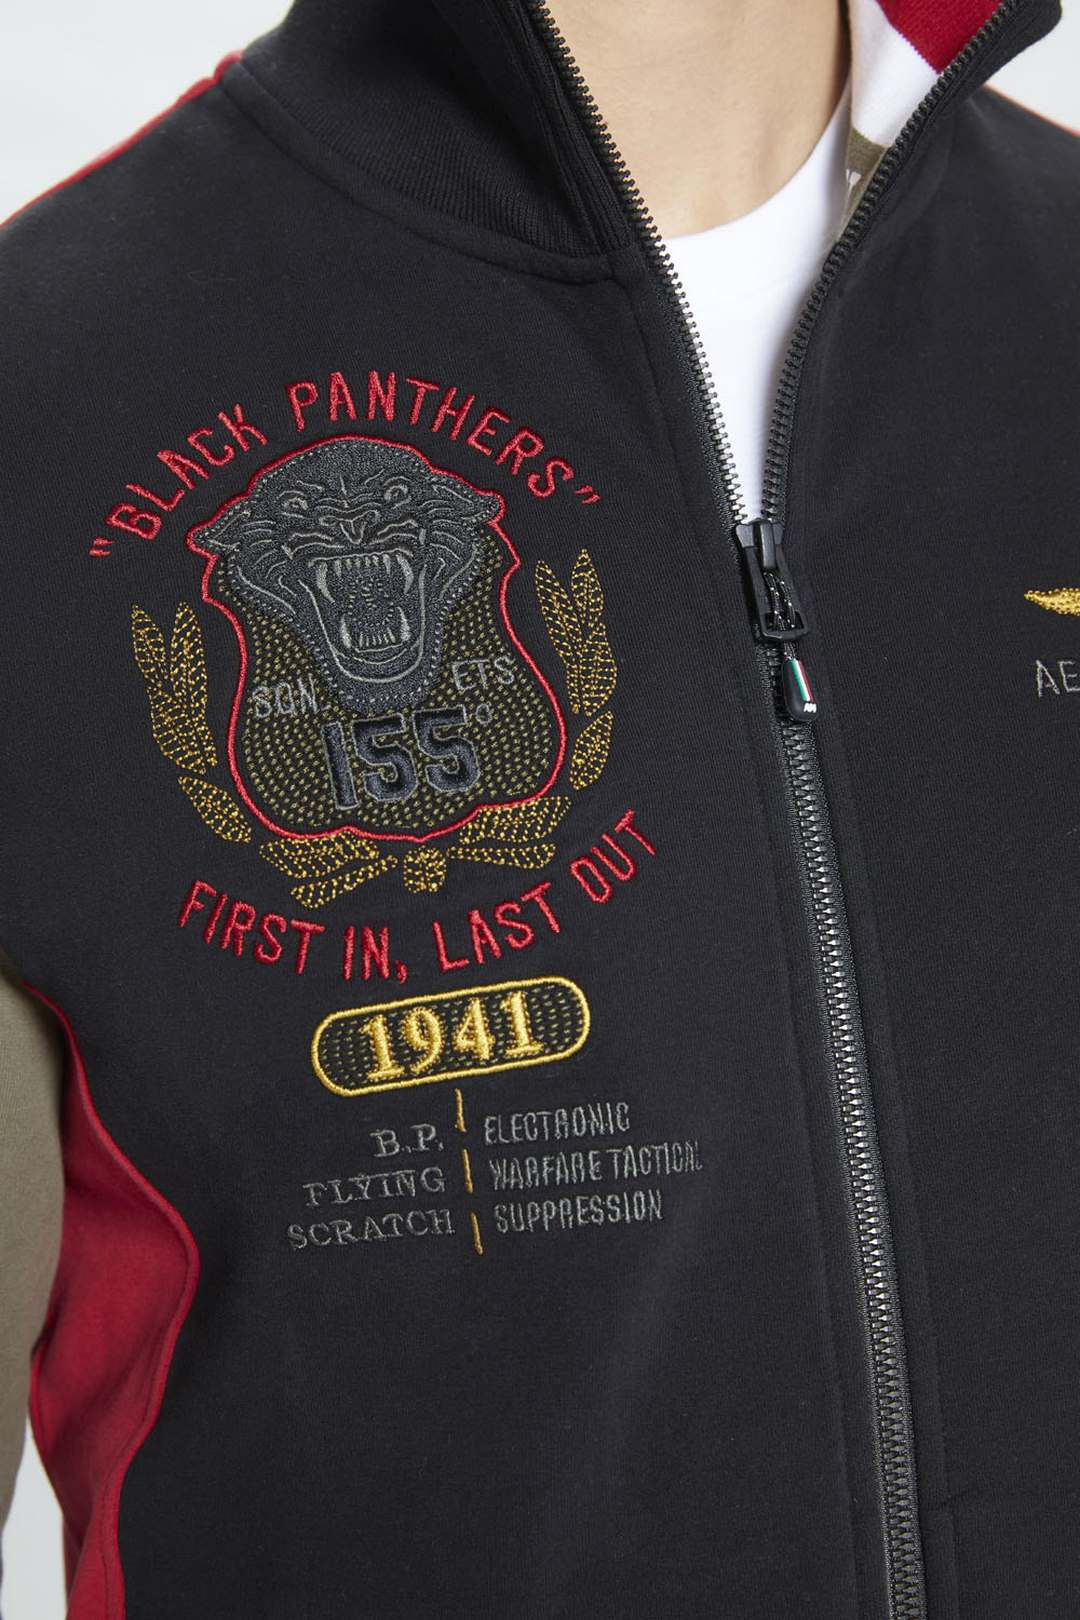 Sweatshirt 155° Gruppo Pantere Nere      5